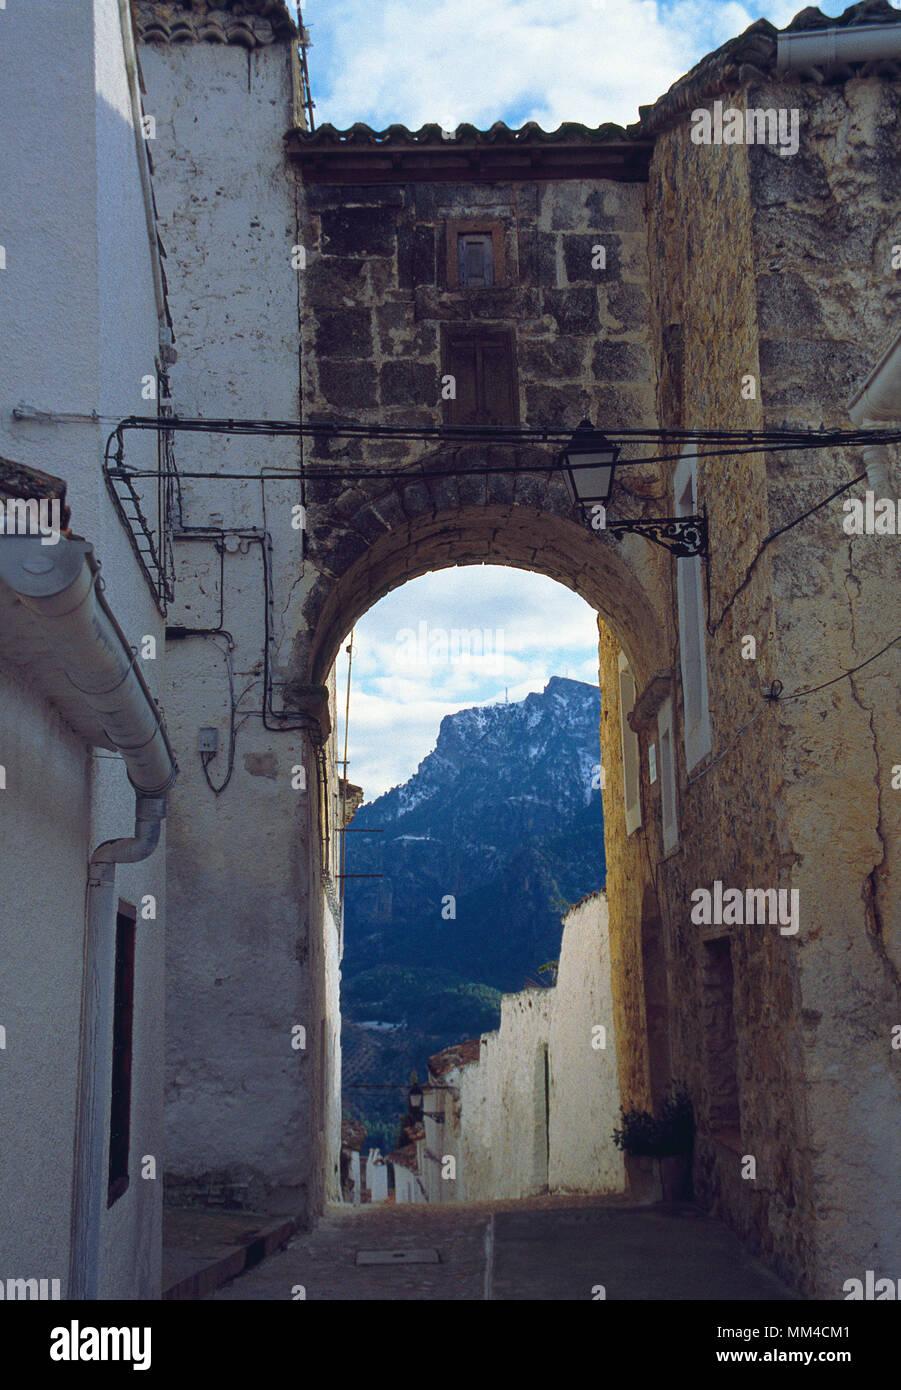 Arch and street. Segura de la Sierra, Jaen province, Andalucia, Spain. - Stock Image